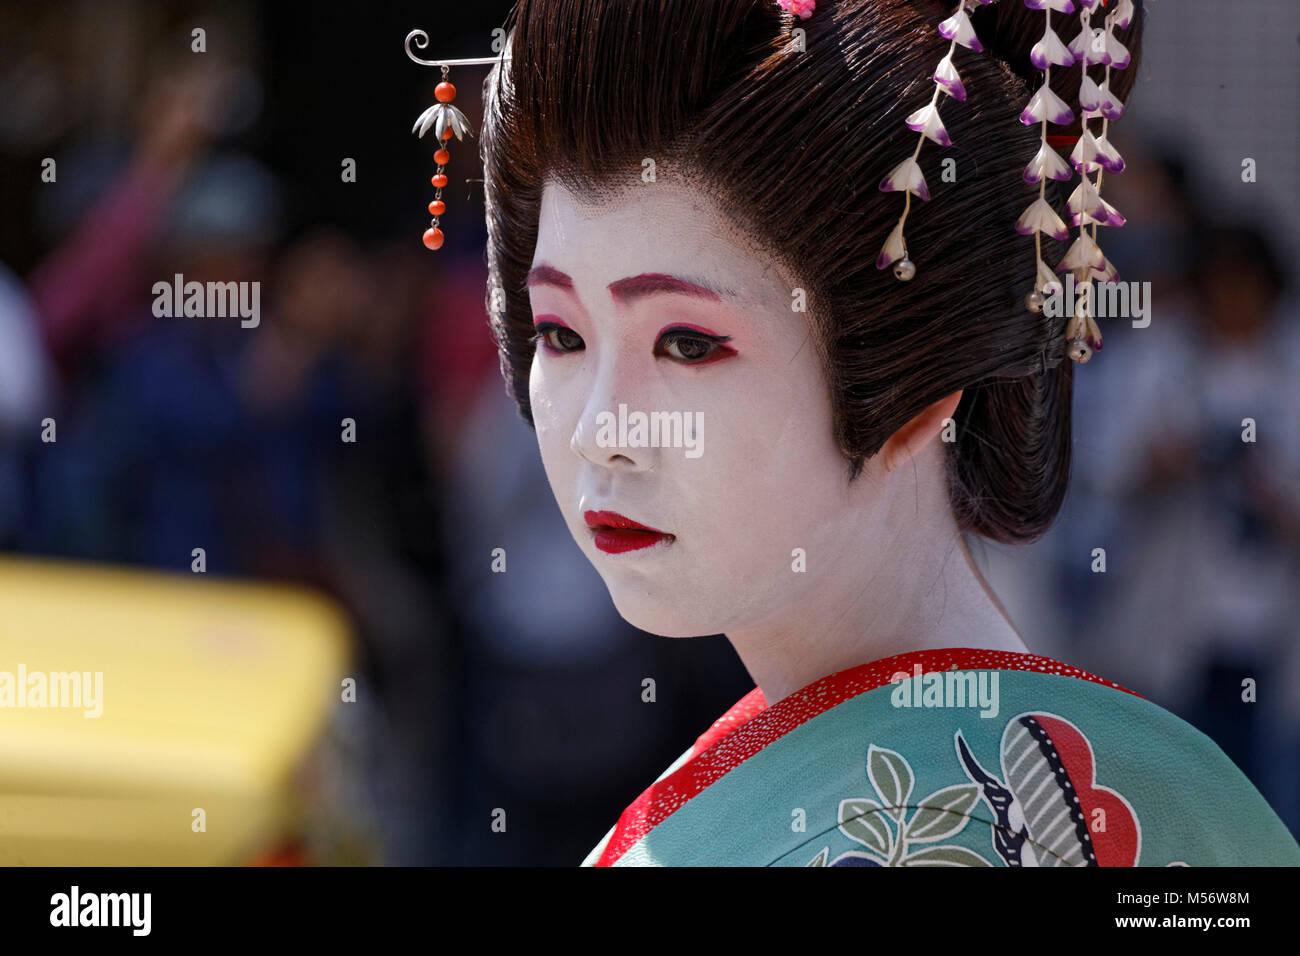 Die Daigyoretsu während der Sanja Matsuri Festival, Tokio, Japan. Stockbild